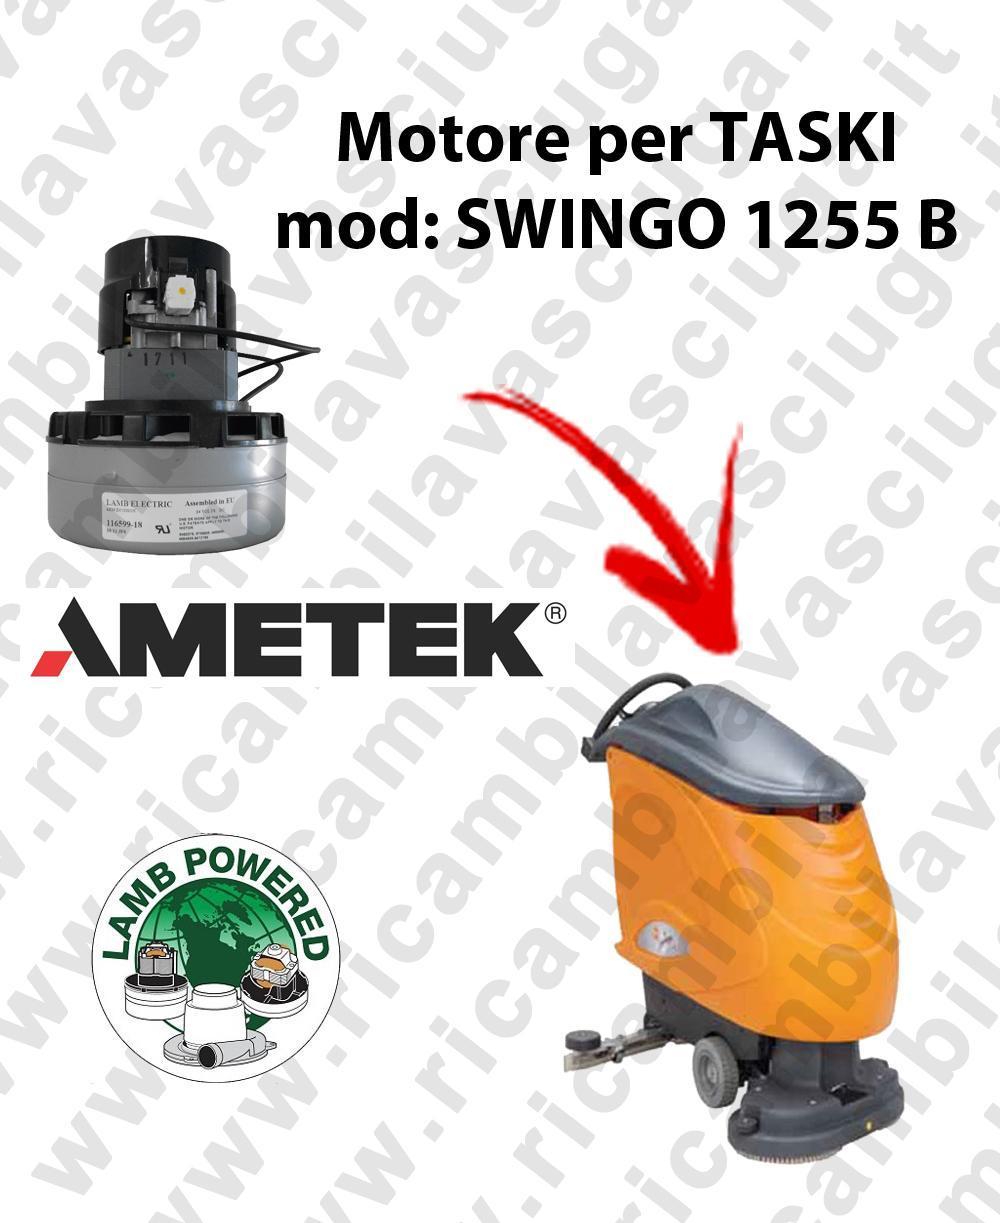 SWINGO 1255 B MOTEUR ASPIRATION LAMB AMATEK pour autolaveuses TASKI